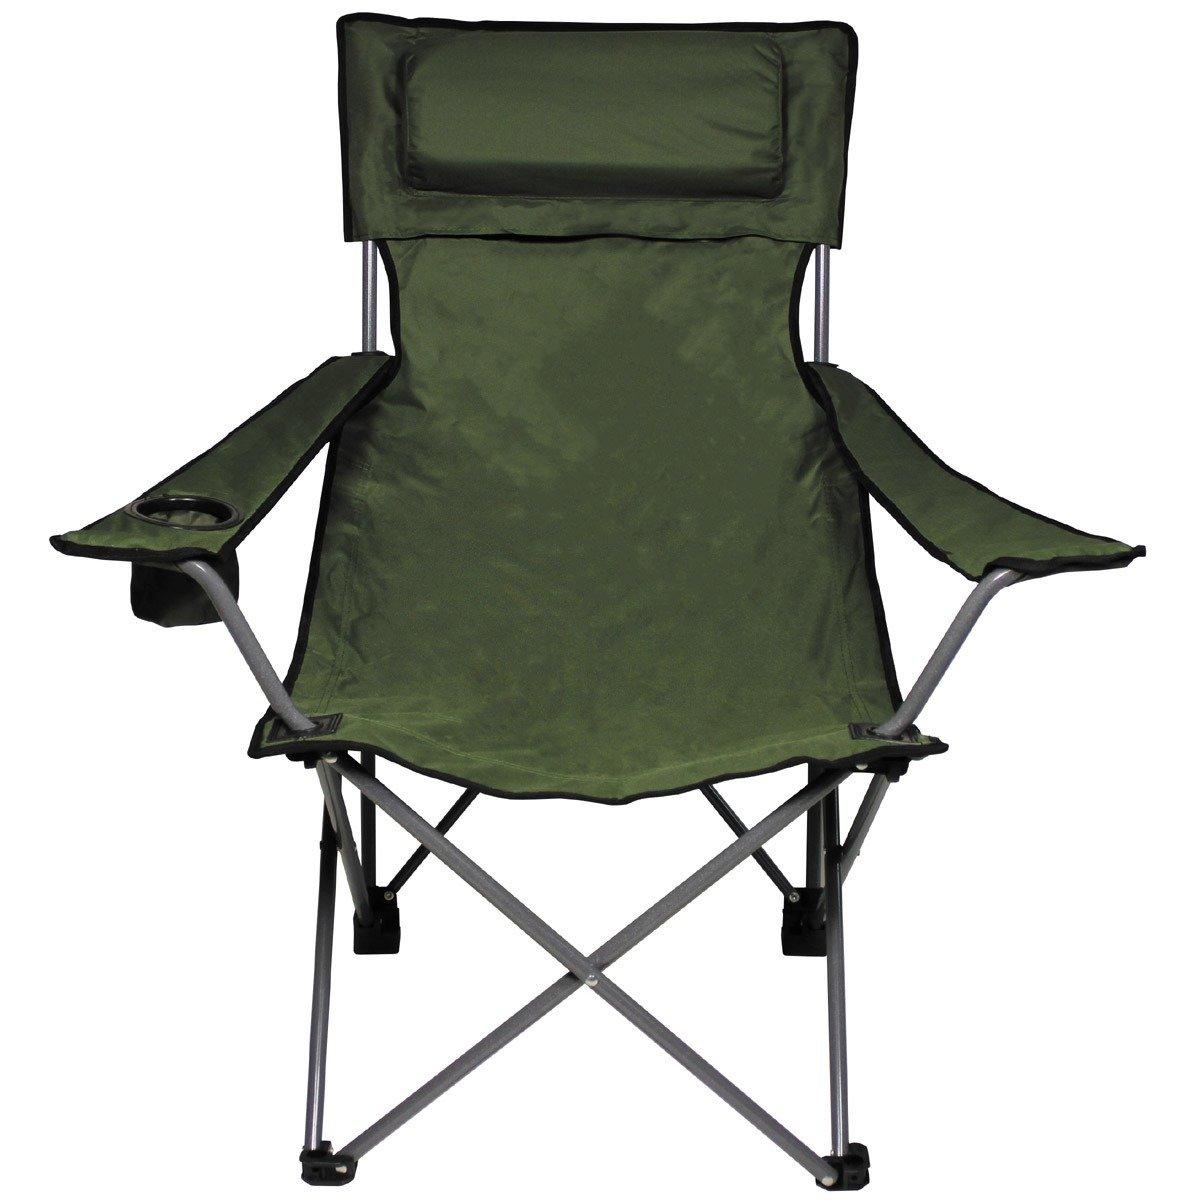 Folding Chair De Lux Green